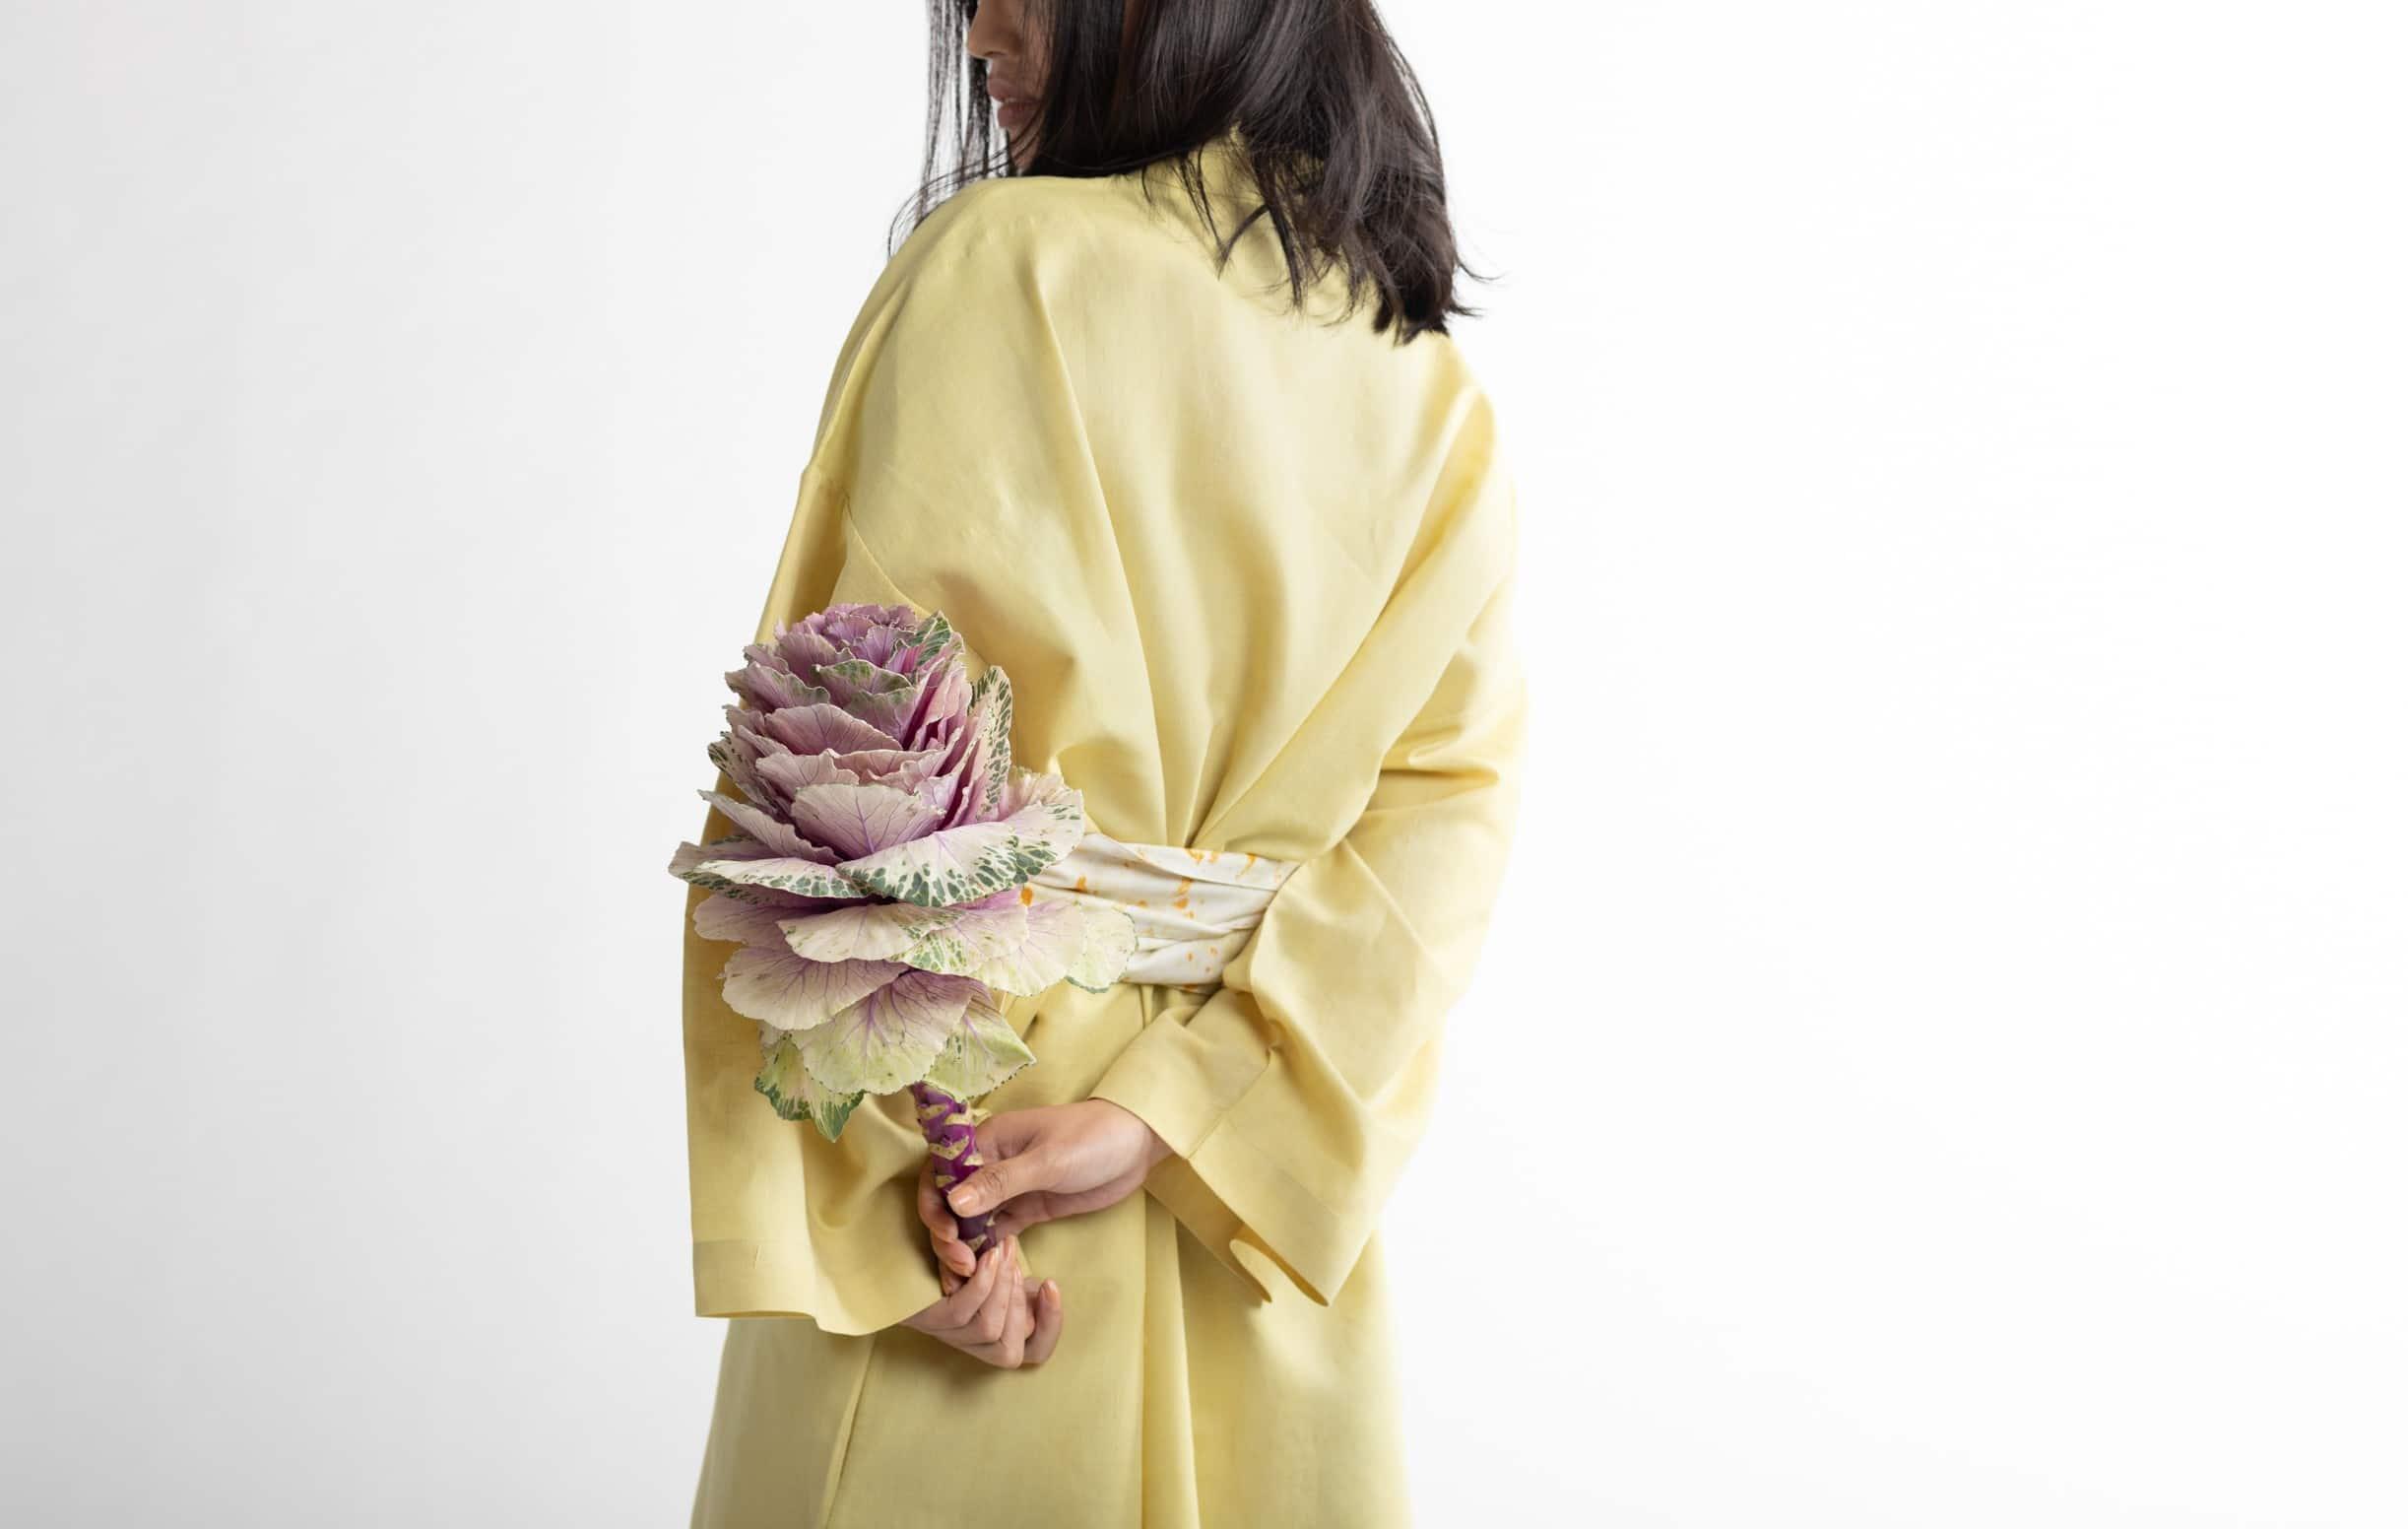 KimonobioMimosa-Nimboo-Mode-FacetoFace